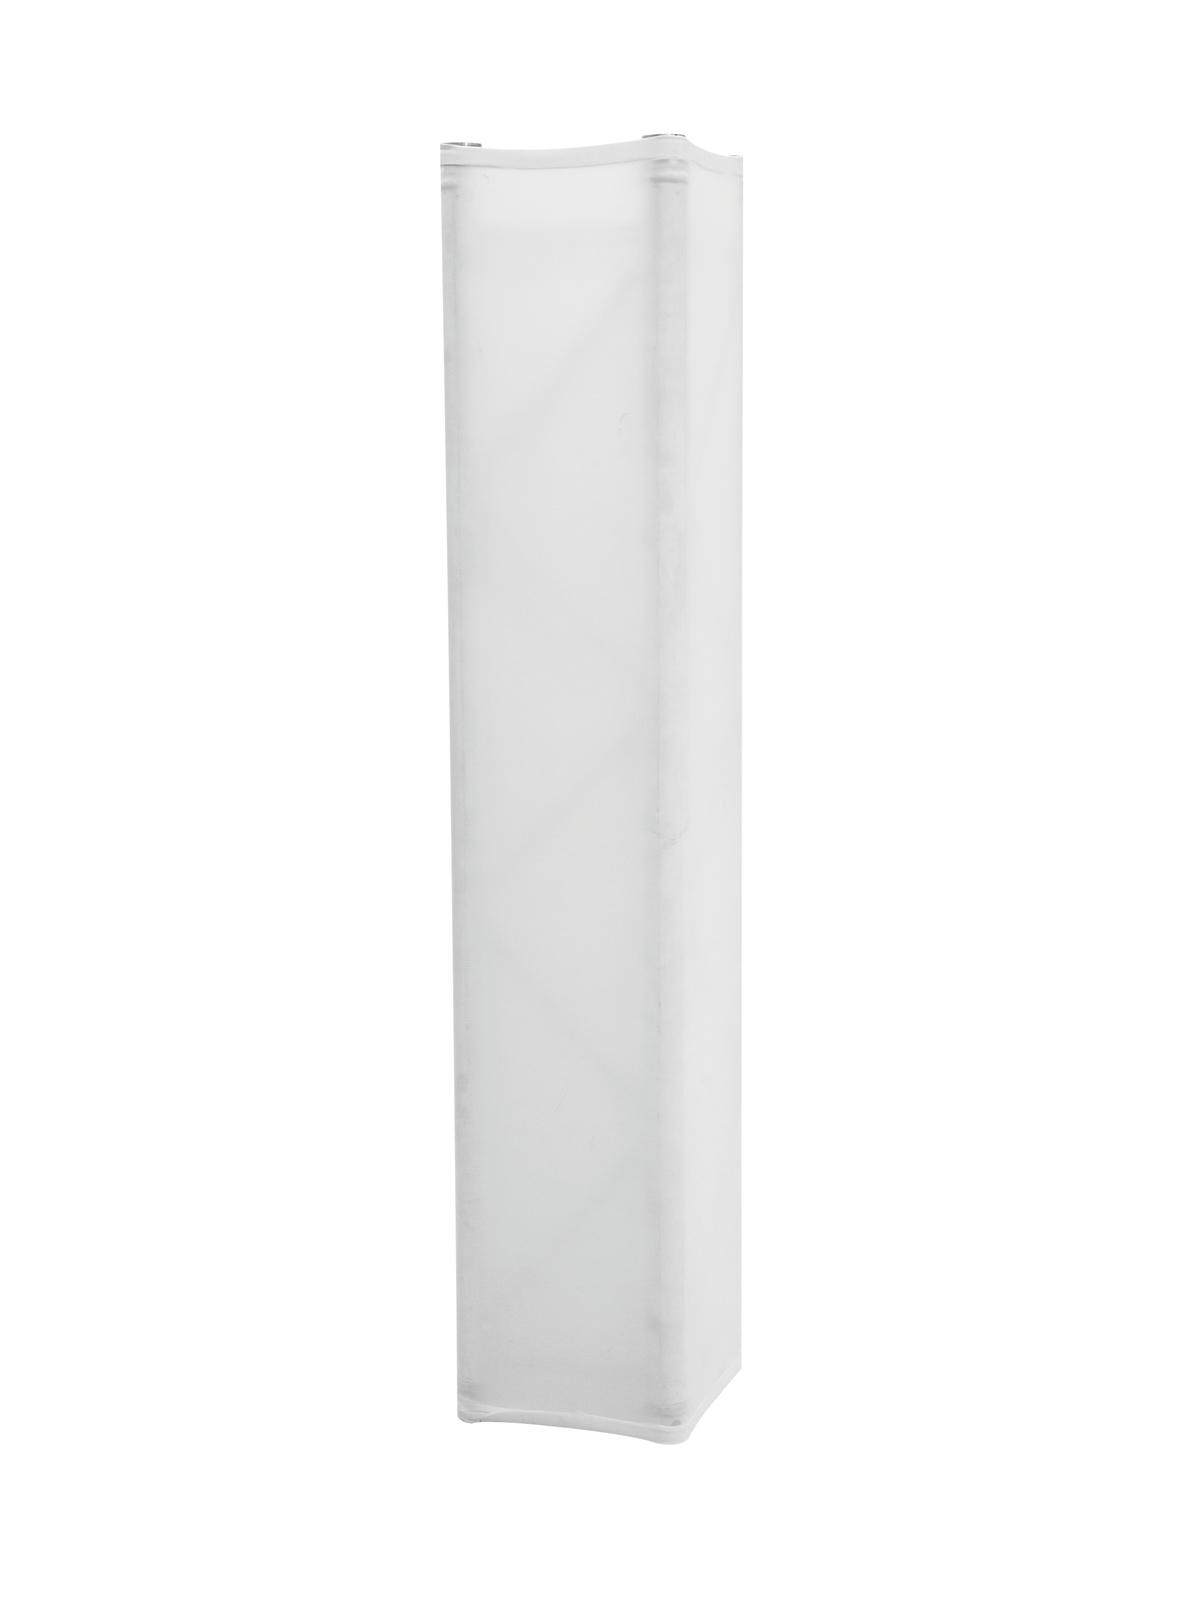 Kryt elastický pro konstrukci 300cm, bílý